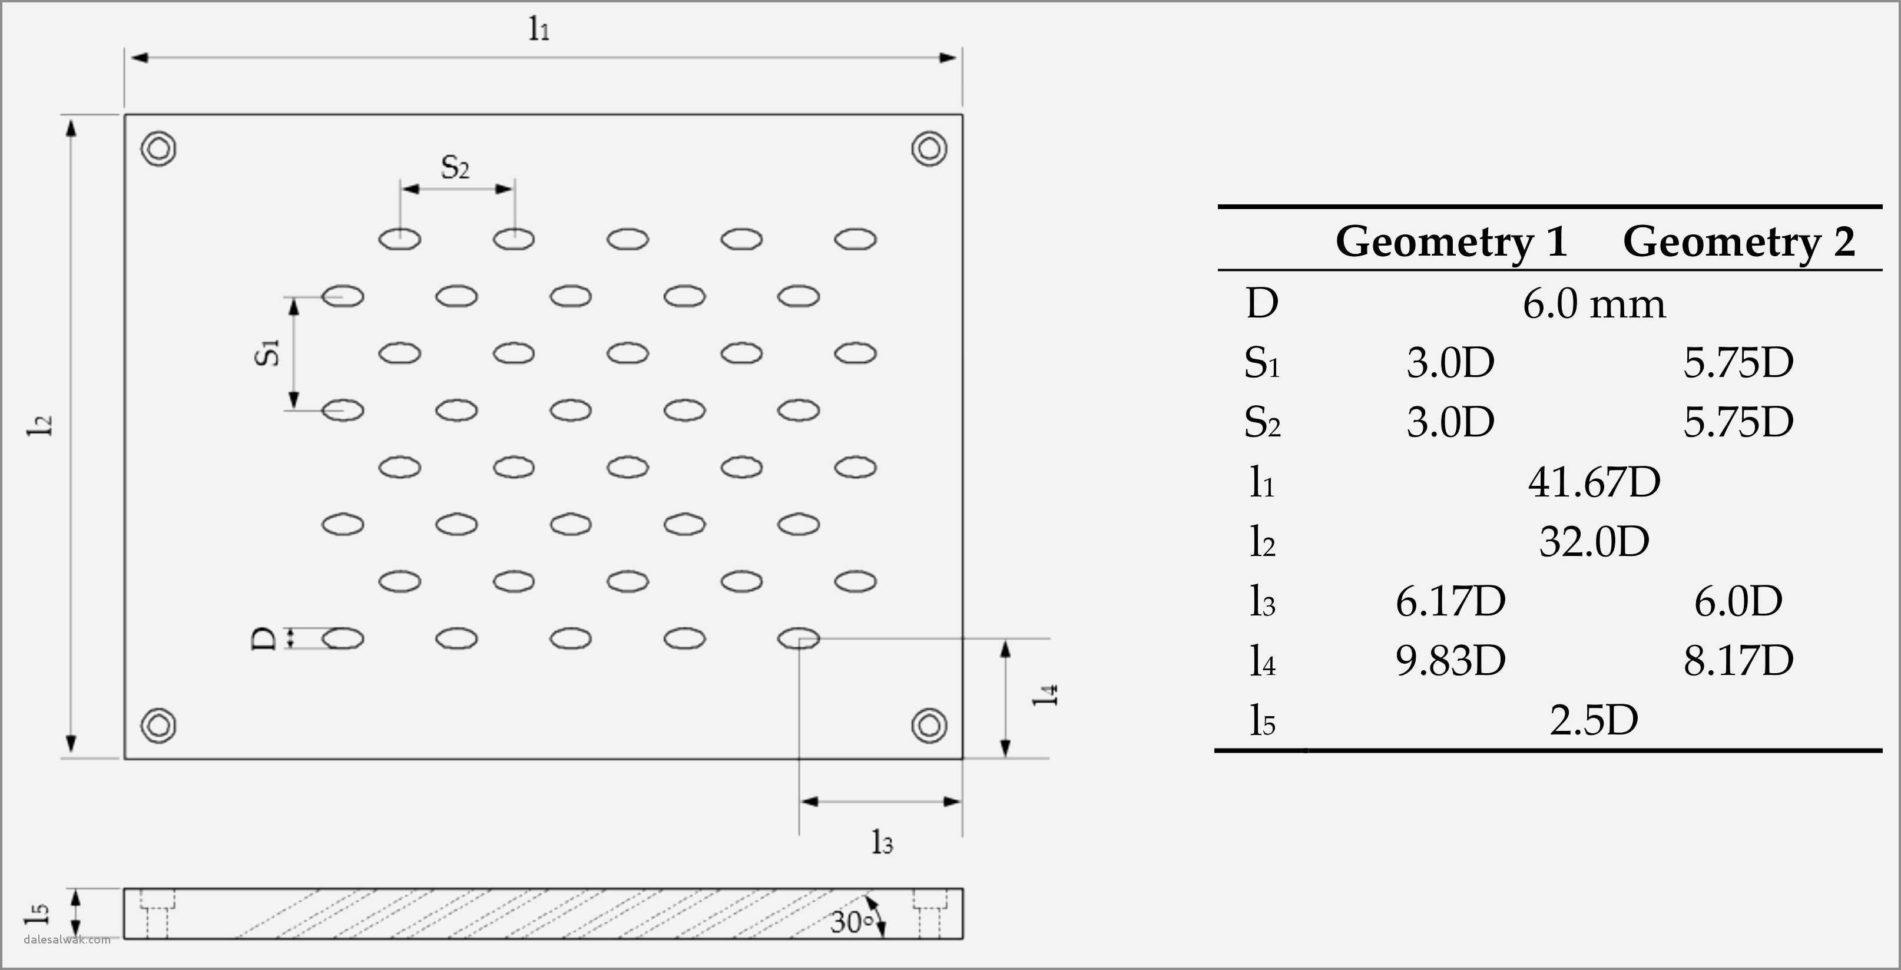 Construction Spreadsheet Templates Free Throughout Free Excel Construction Schedule Template And Project Calendar Image